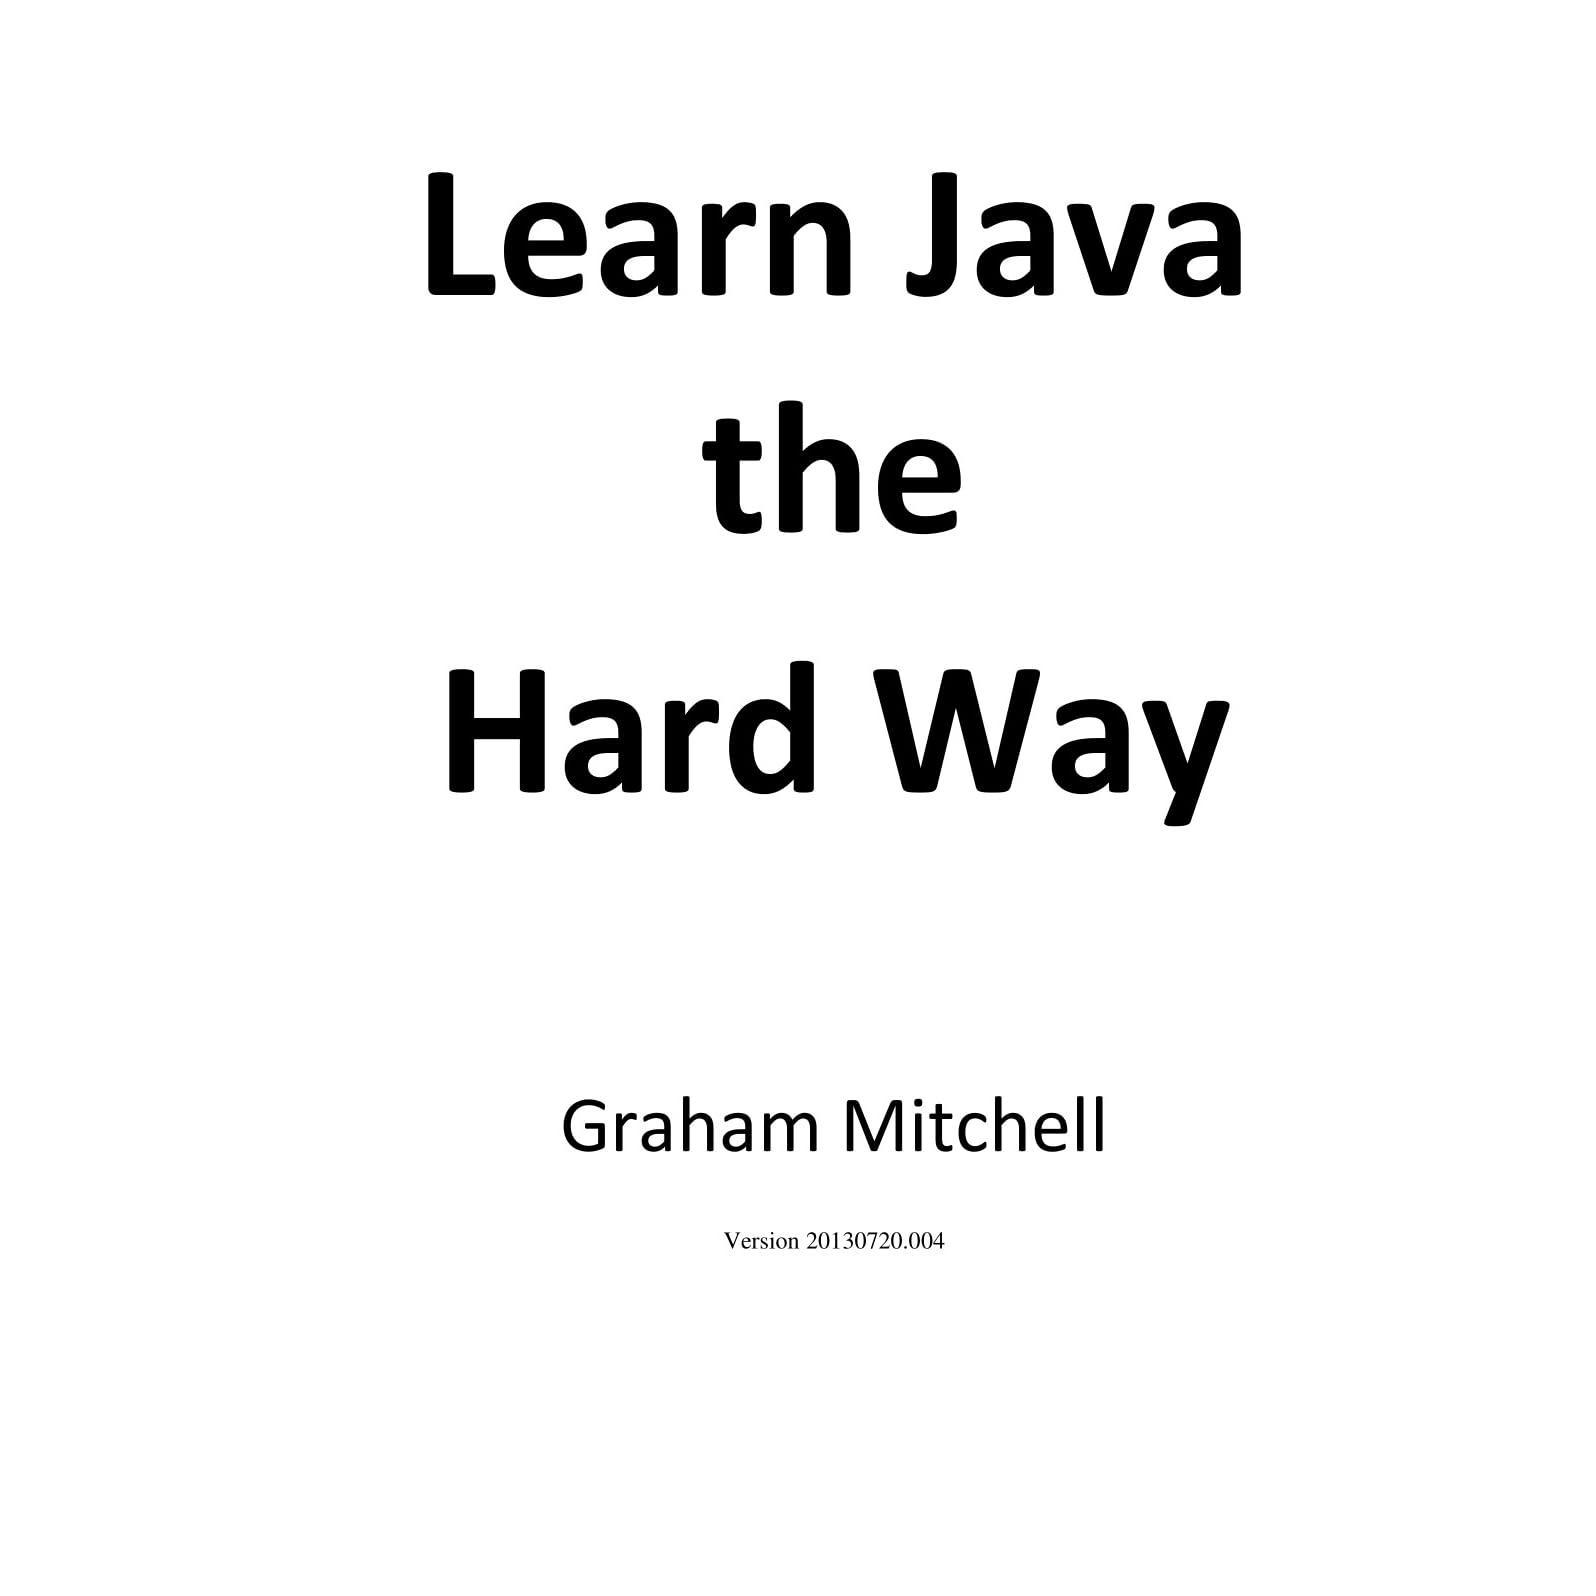 Learn java the hard way graham mitchell pdf